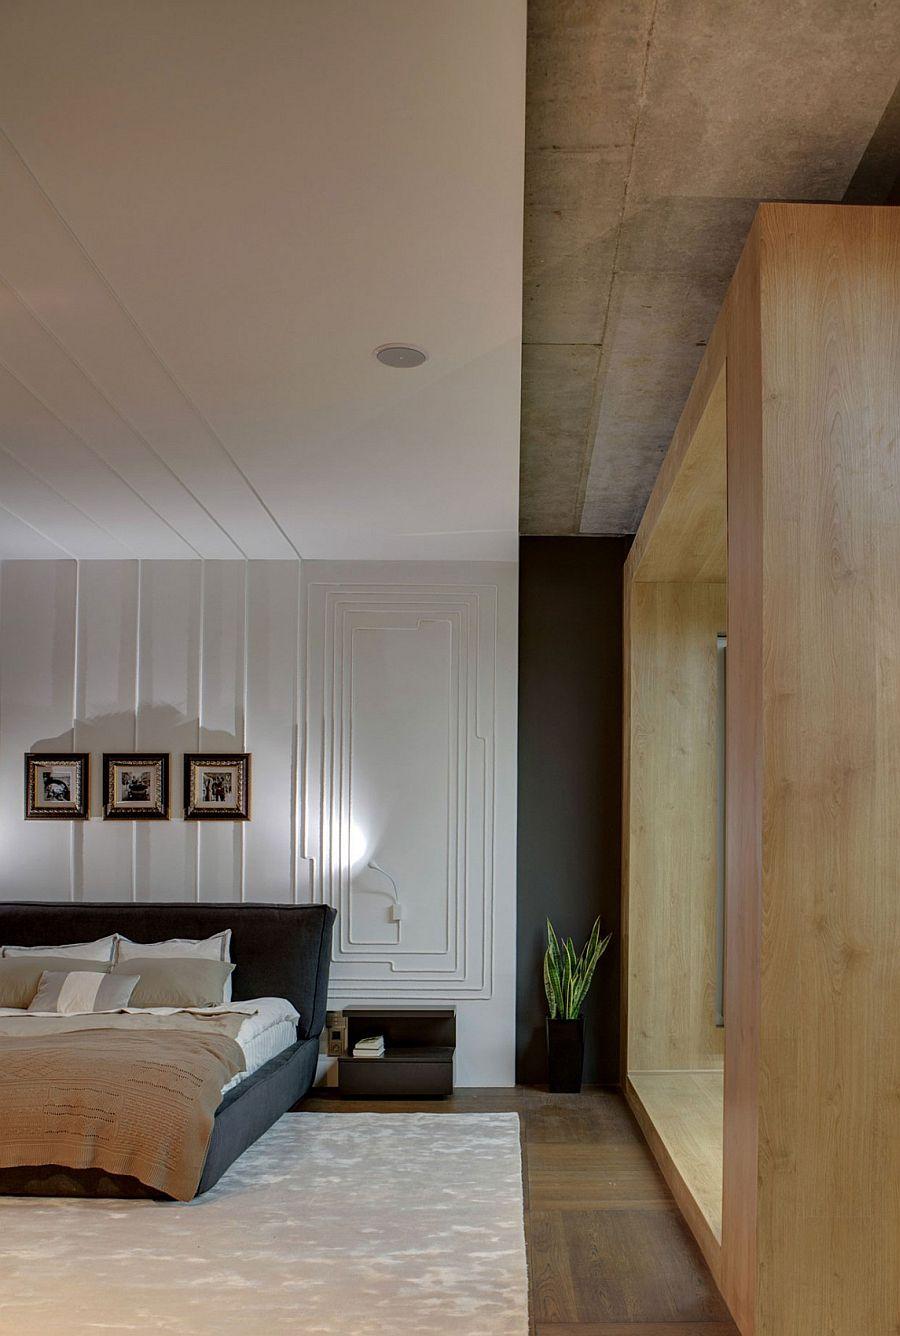 Unique headboard wall and bedside lighting idea